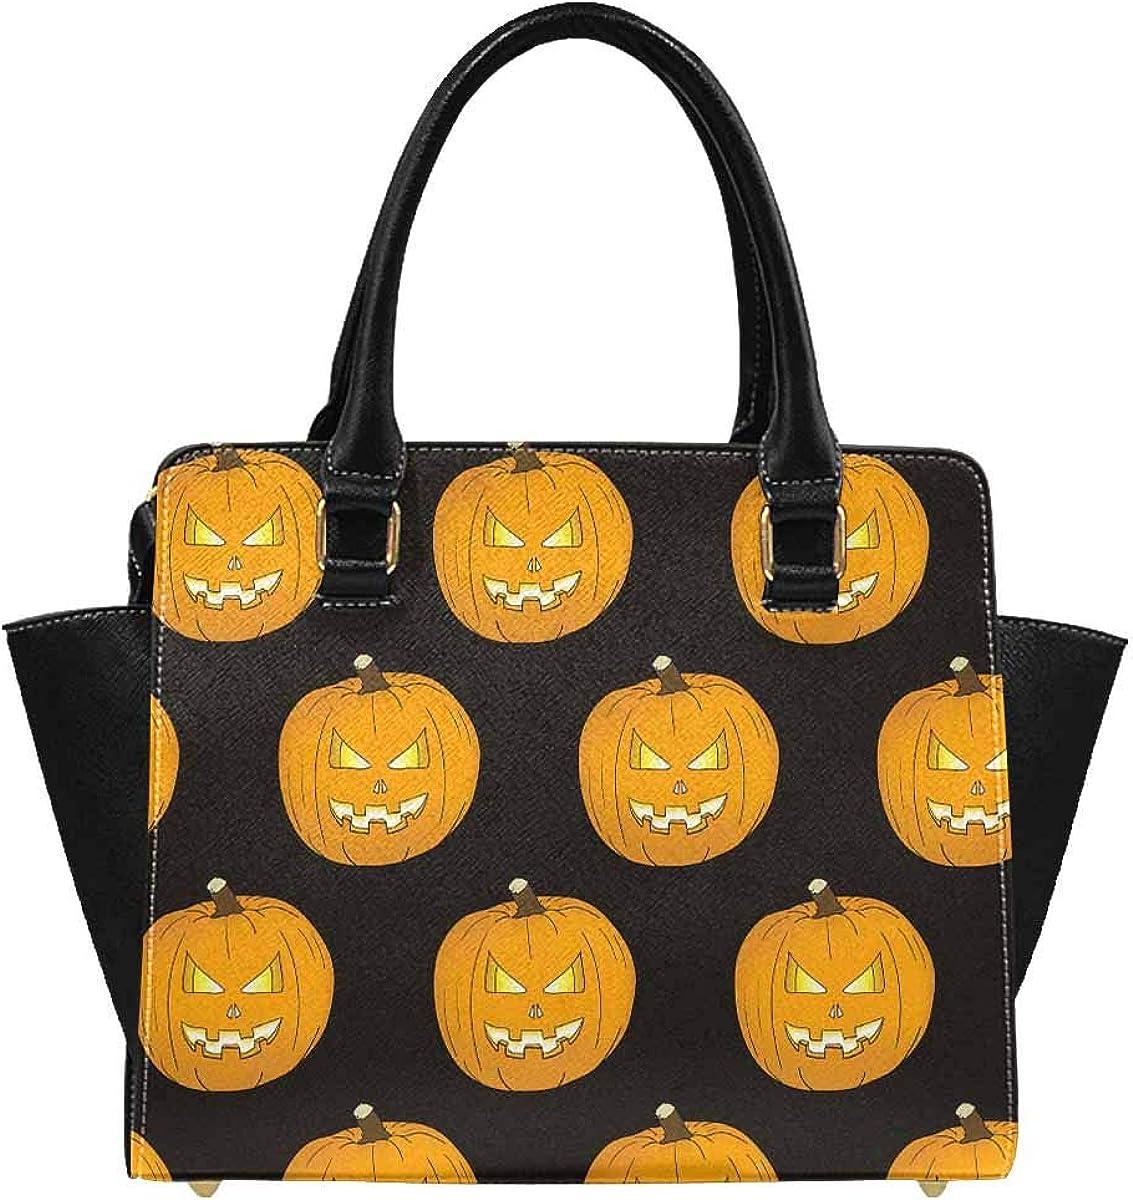 INTERESTPRINT Halloween Vintage with Pumpkin PU Leather Satchel Shoulder Tote Bags Top Handle Handbags